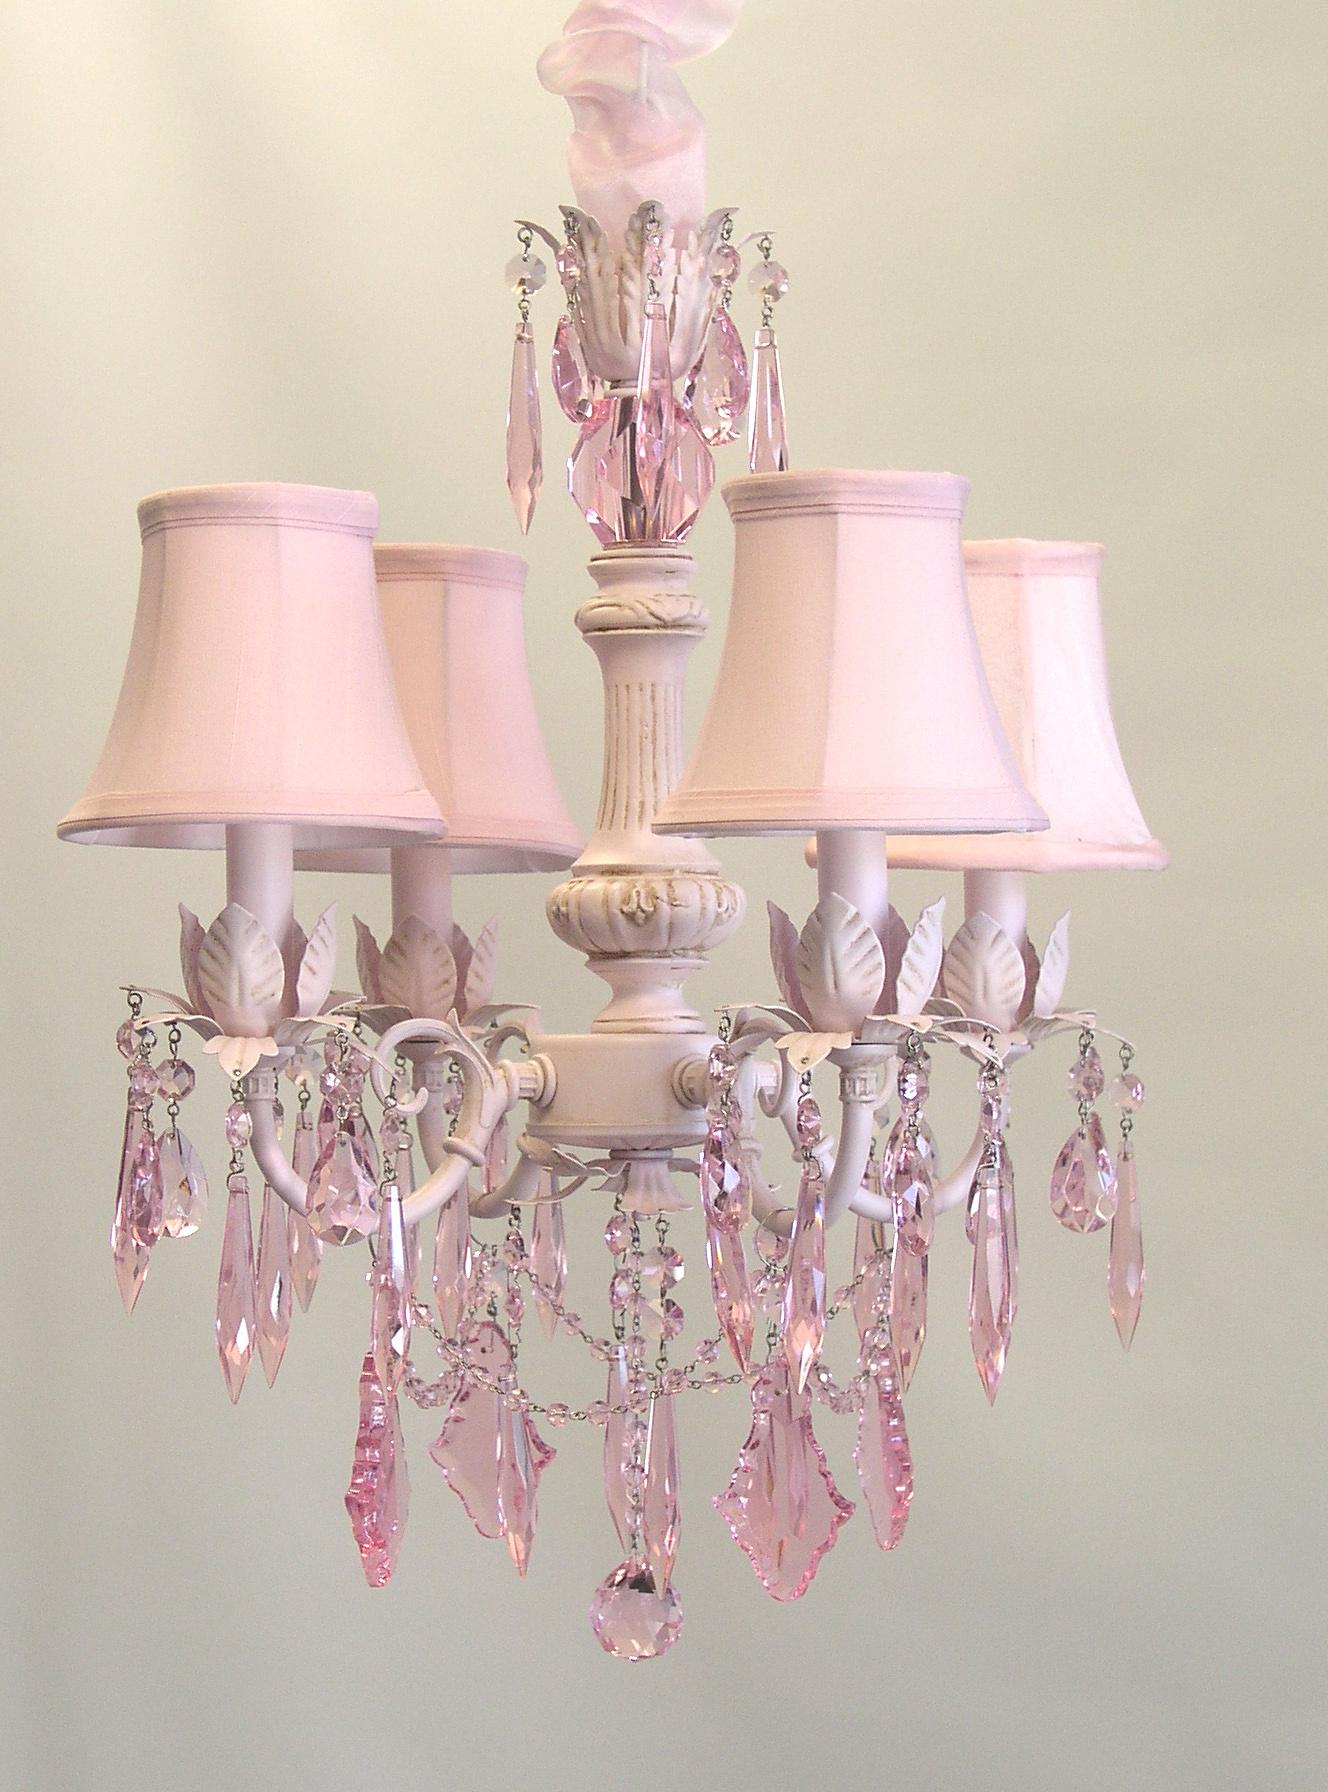 I Lite 4 U Shabby Chic Style Mini Chandeliers Amp Lighting